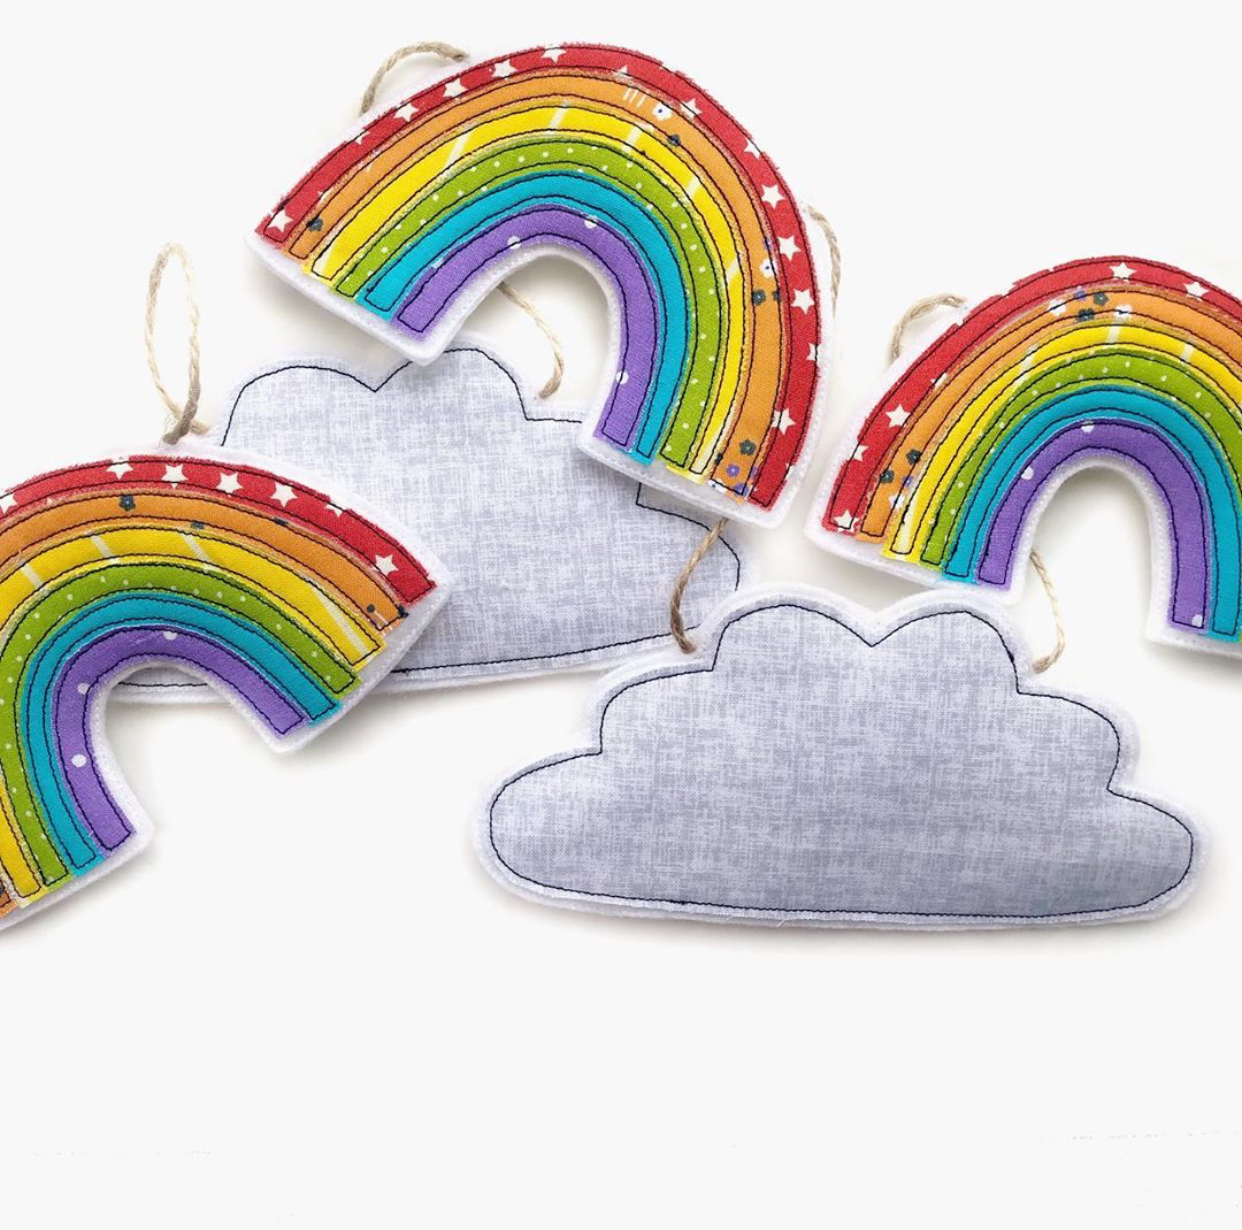 Tink&Reu, Fabric Bright Rainbow Garland